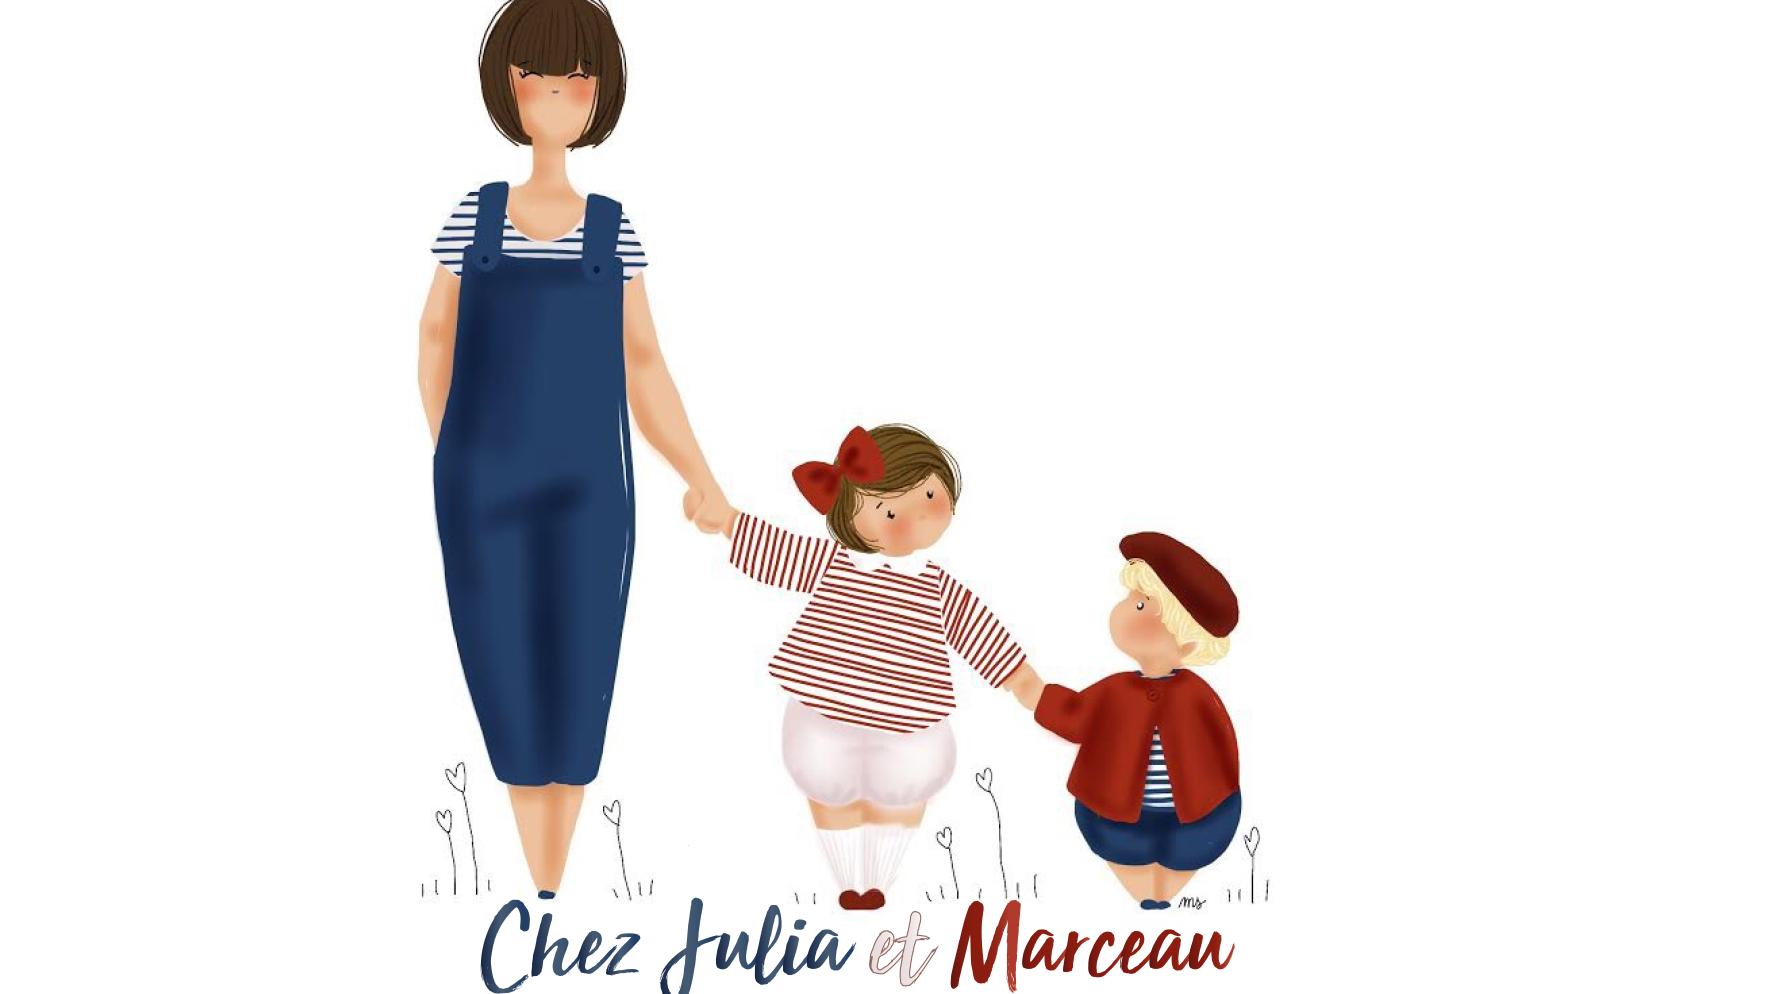 LOGO_-_Chez_Julia_et_Marceau-1523899503.jpg